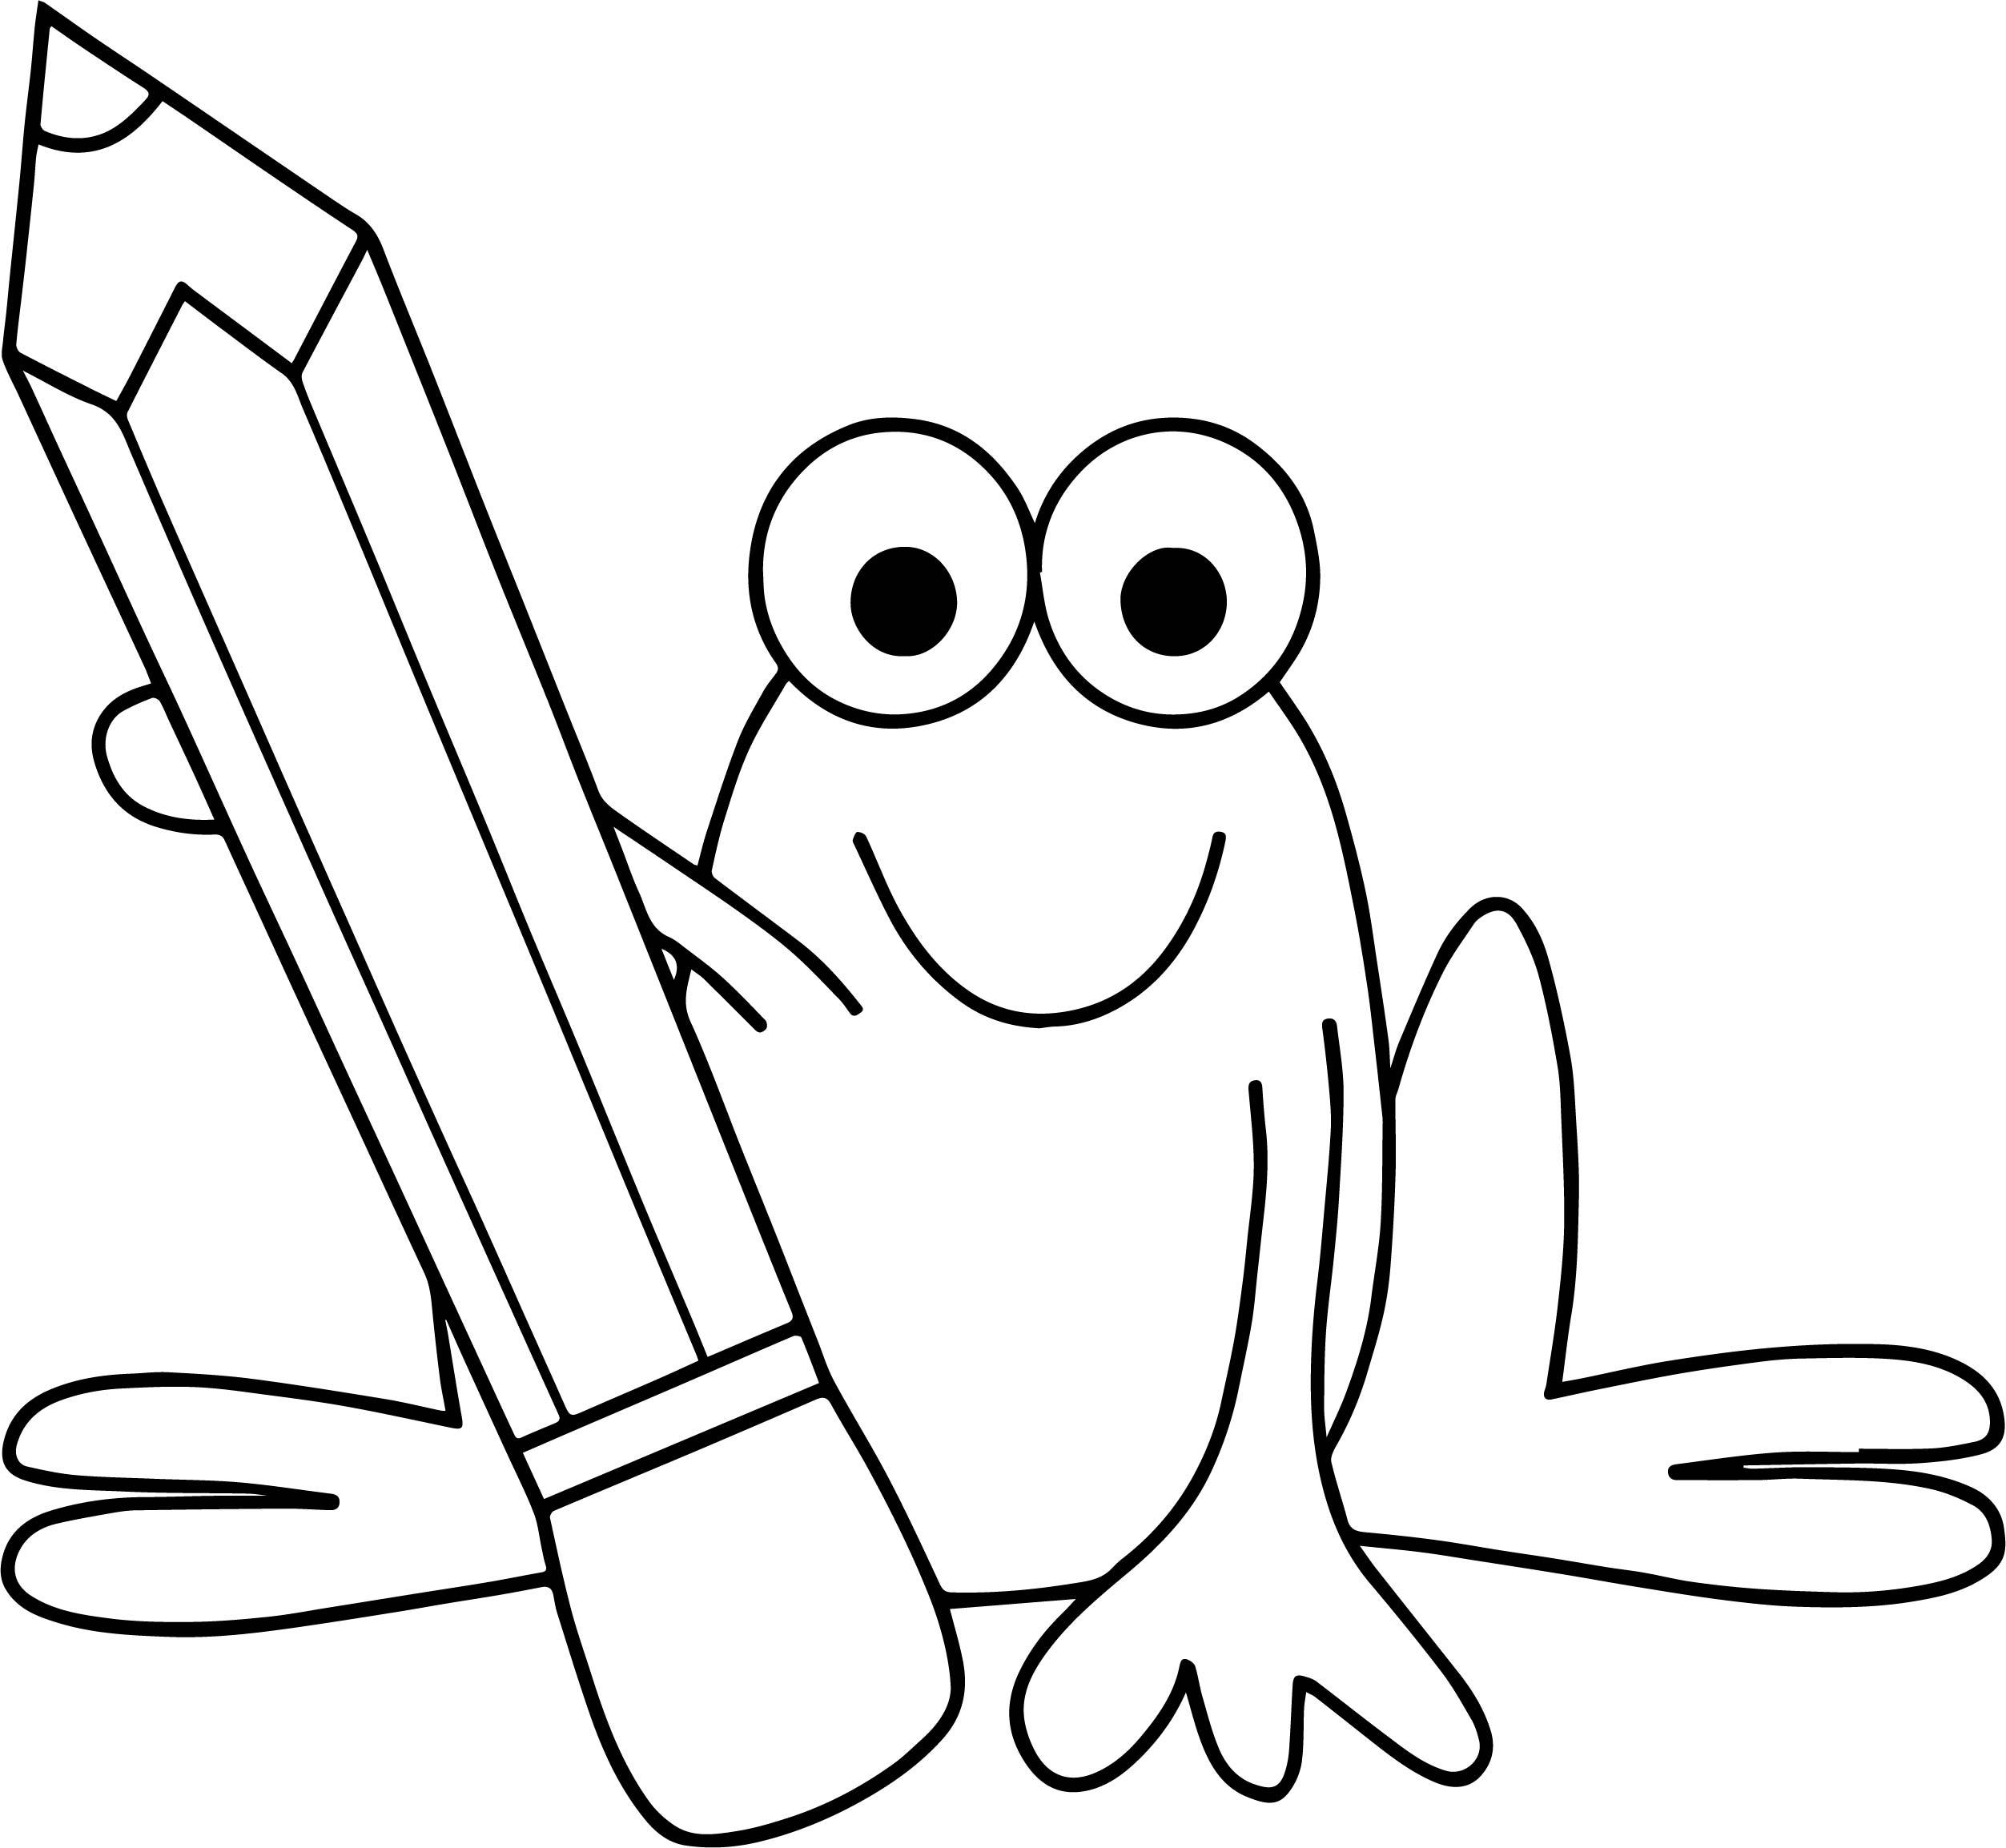 frog pencil coloring page - Pencil Coloring Page